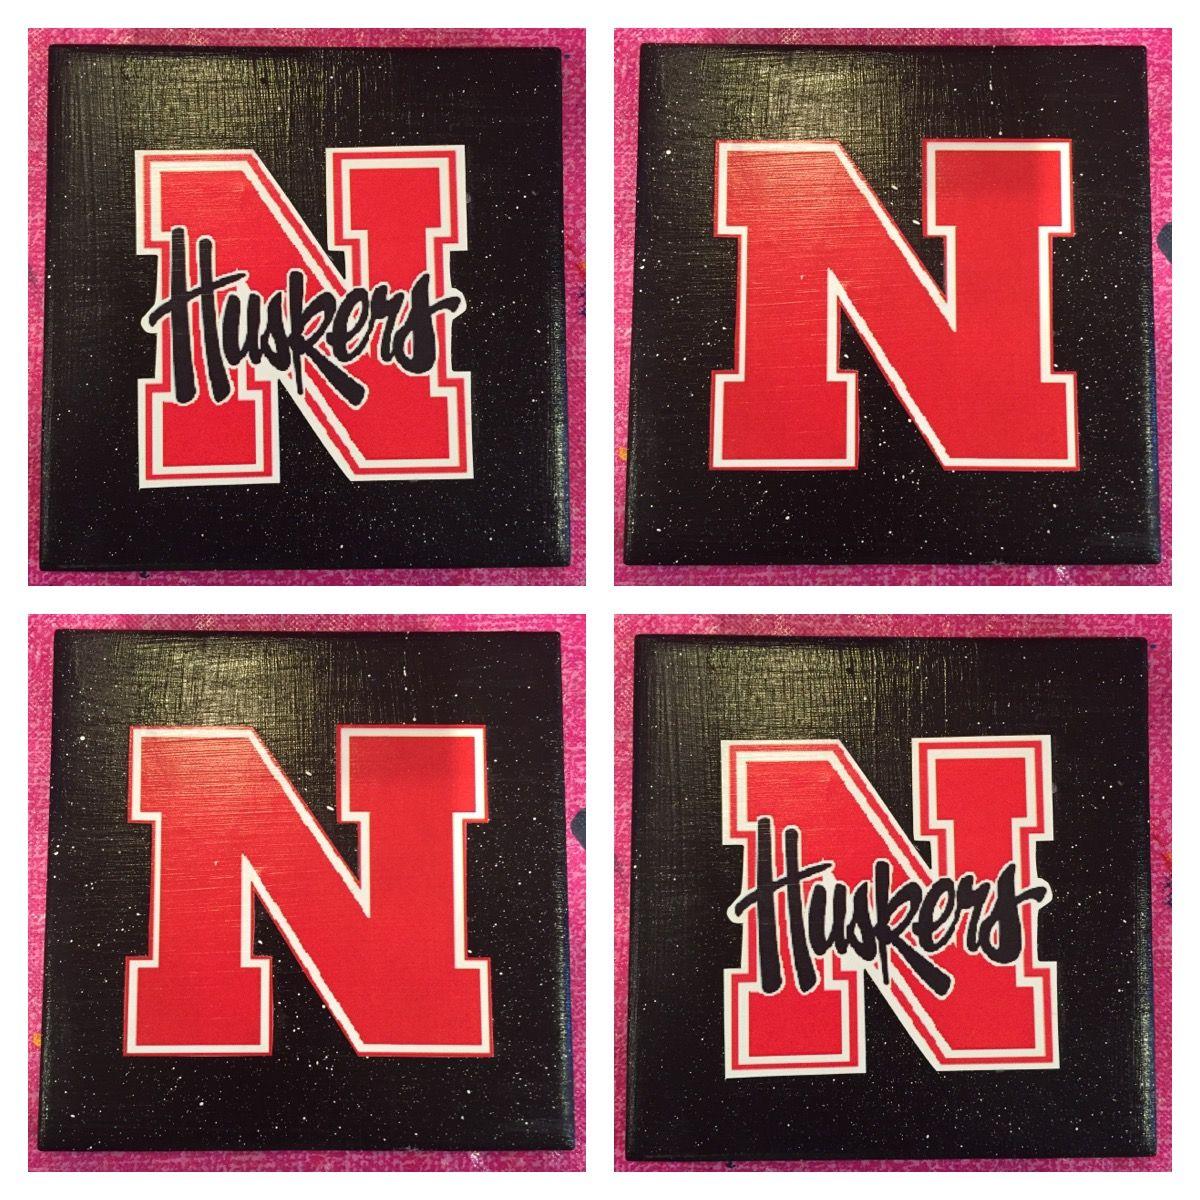 Nebraska Huskers Coasters! These coaster sets are handmade